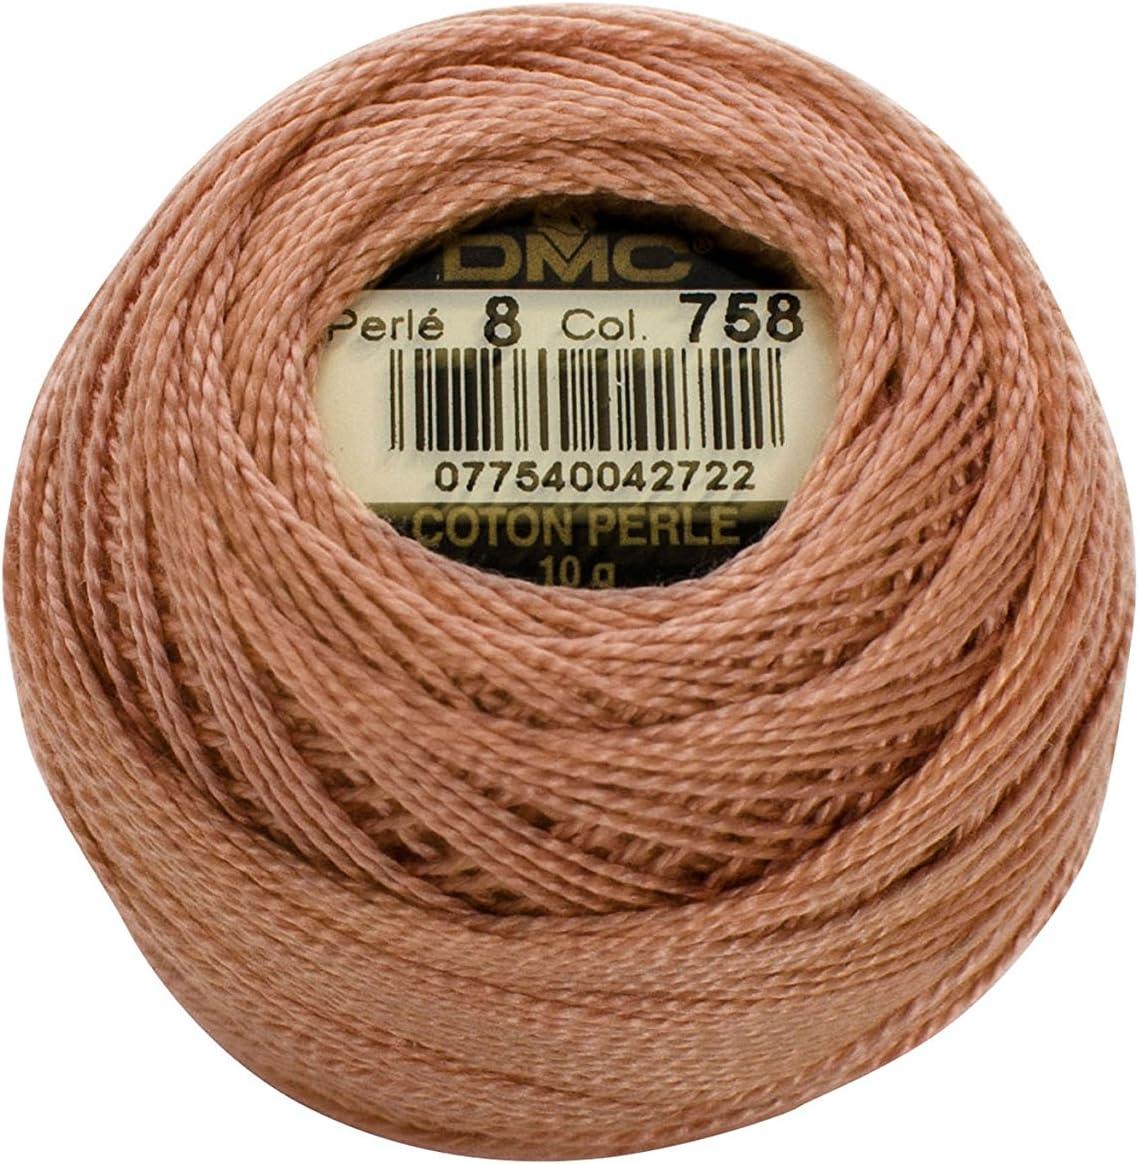 Very Light Blue Green DMC 116 8-504 Pearl Cotton Thread Balls Size 8